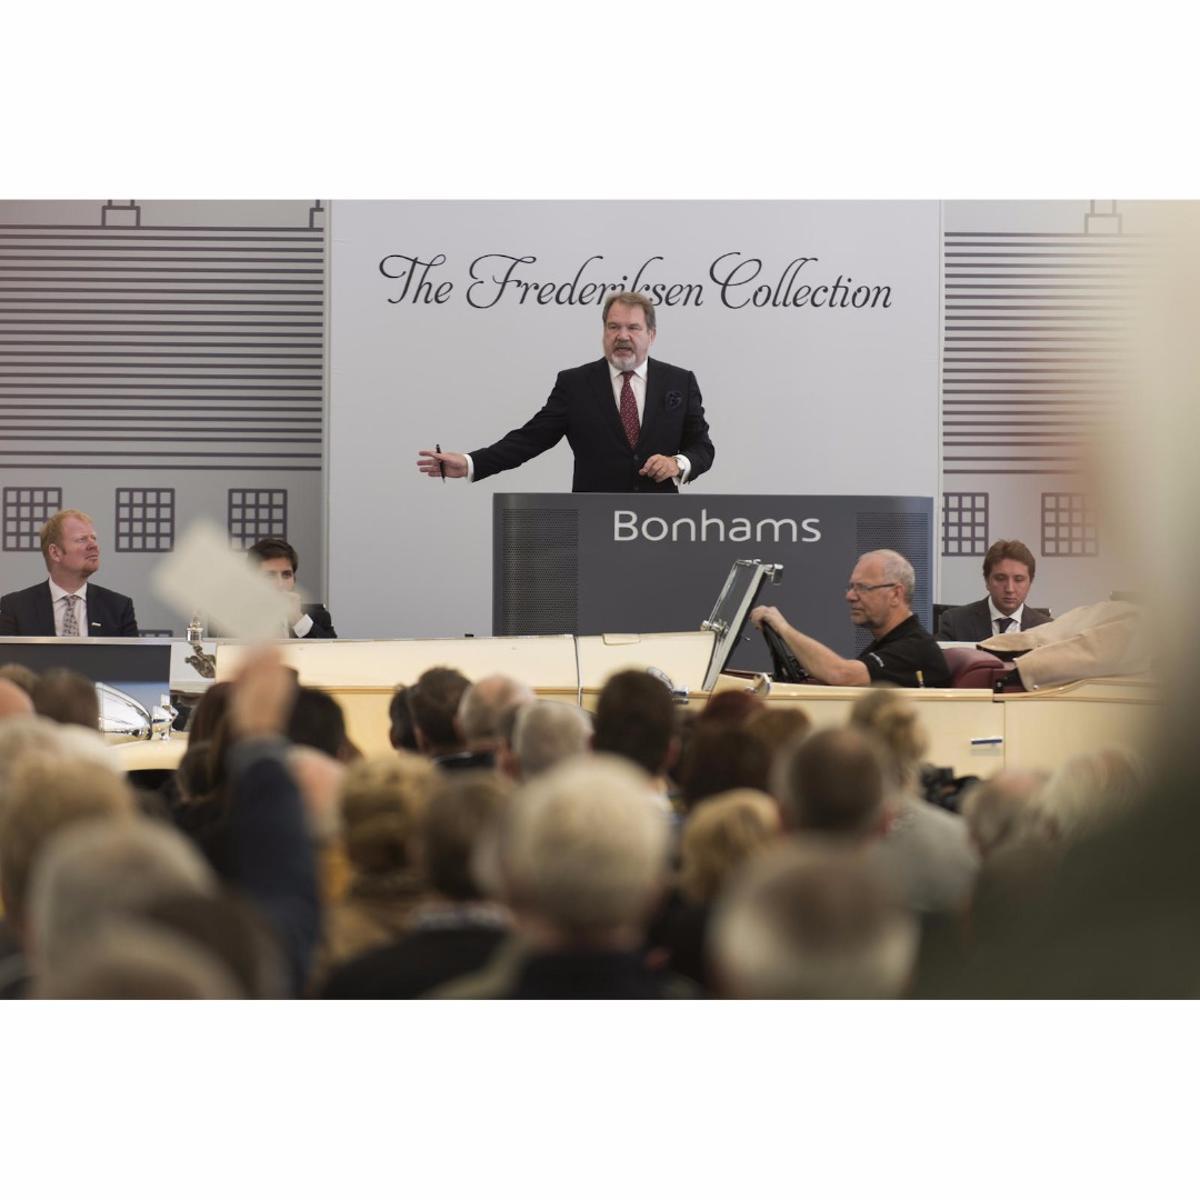 Malcolm Barber presiding over Bonham's sale of the Frederiksen Collection